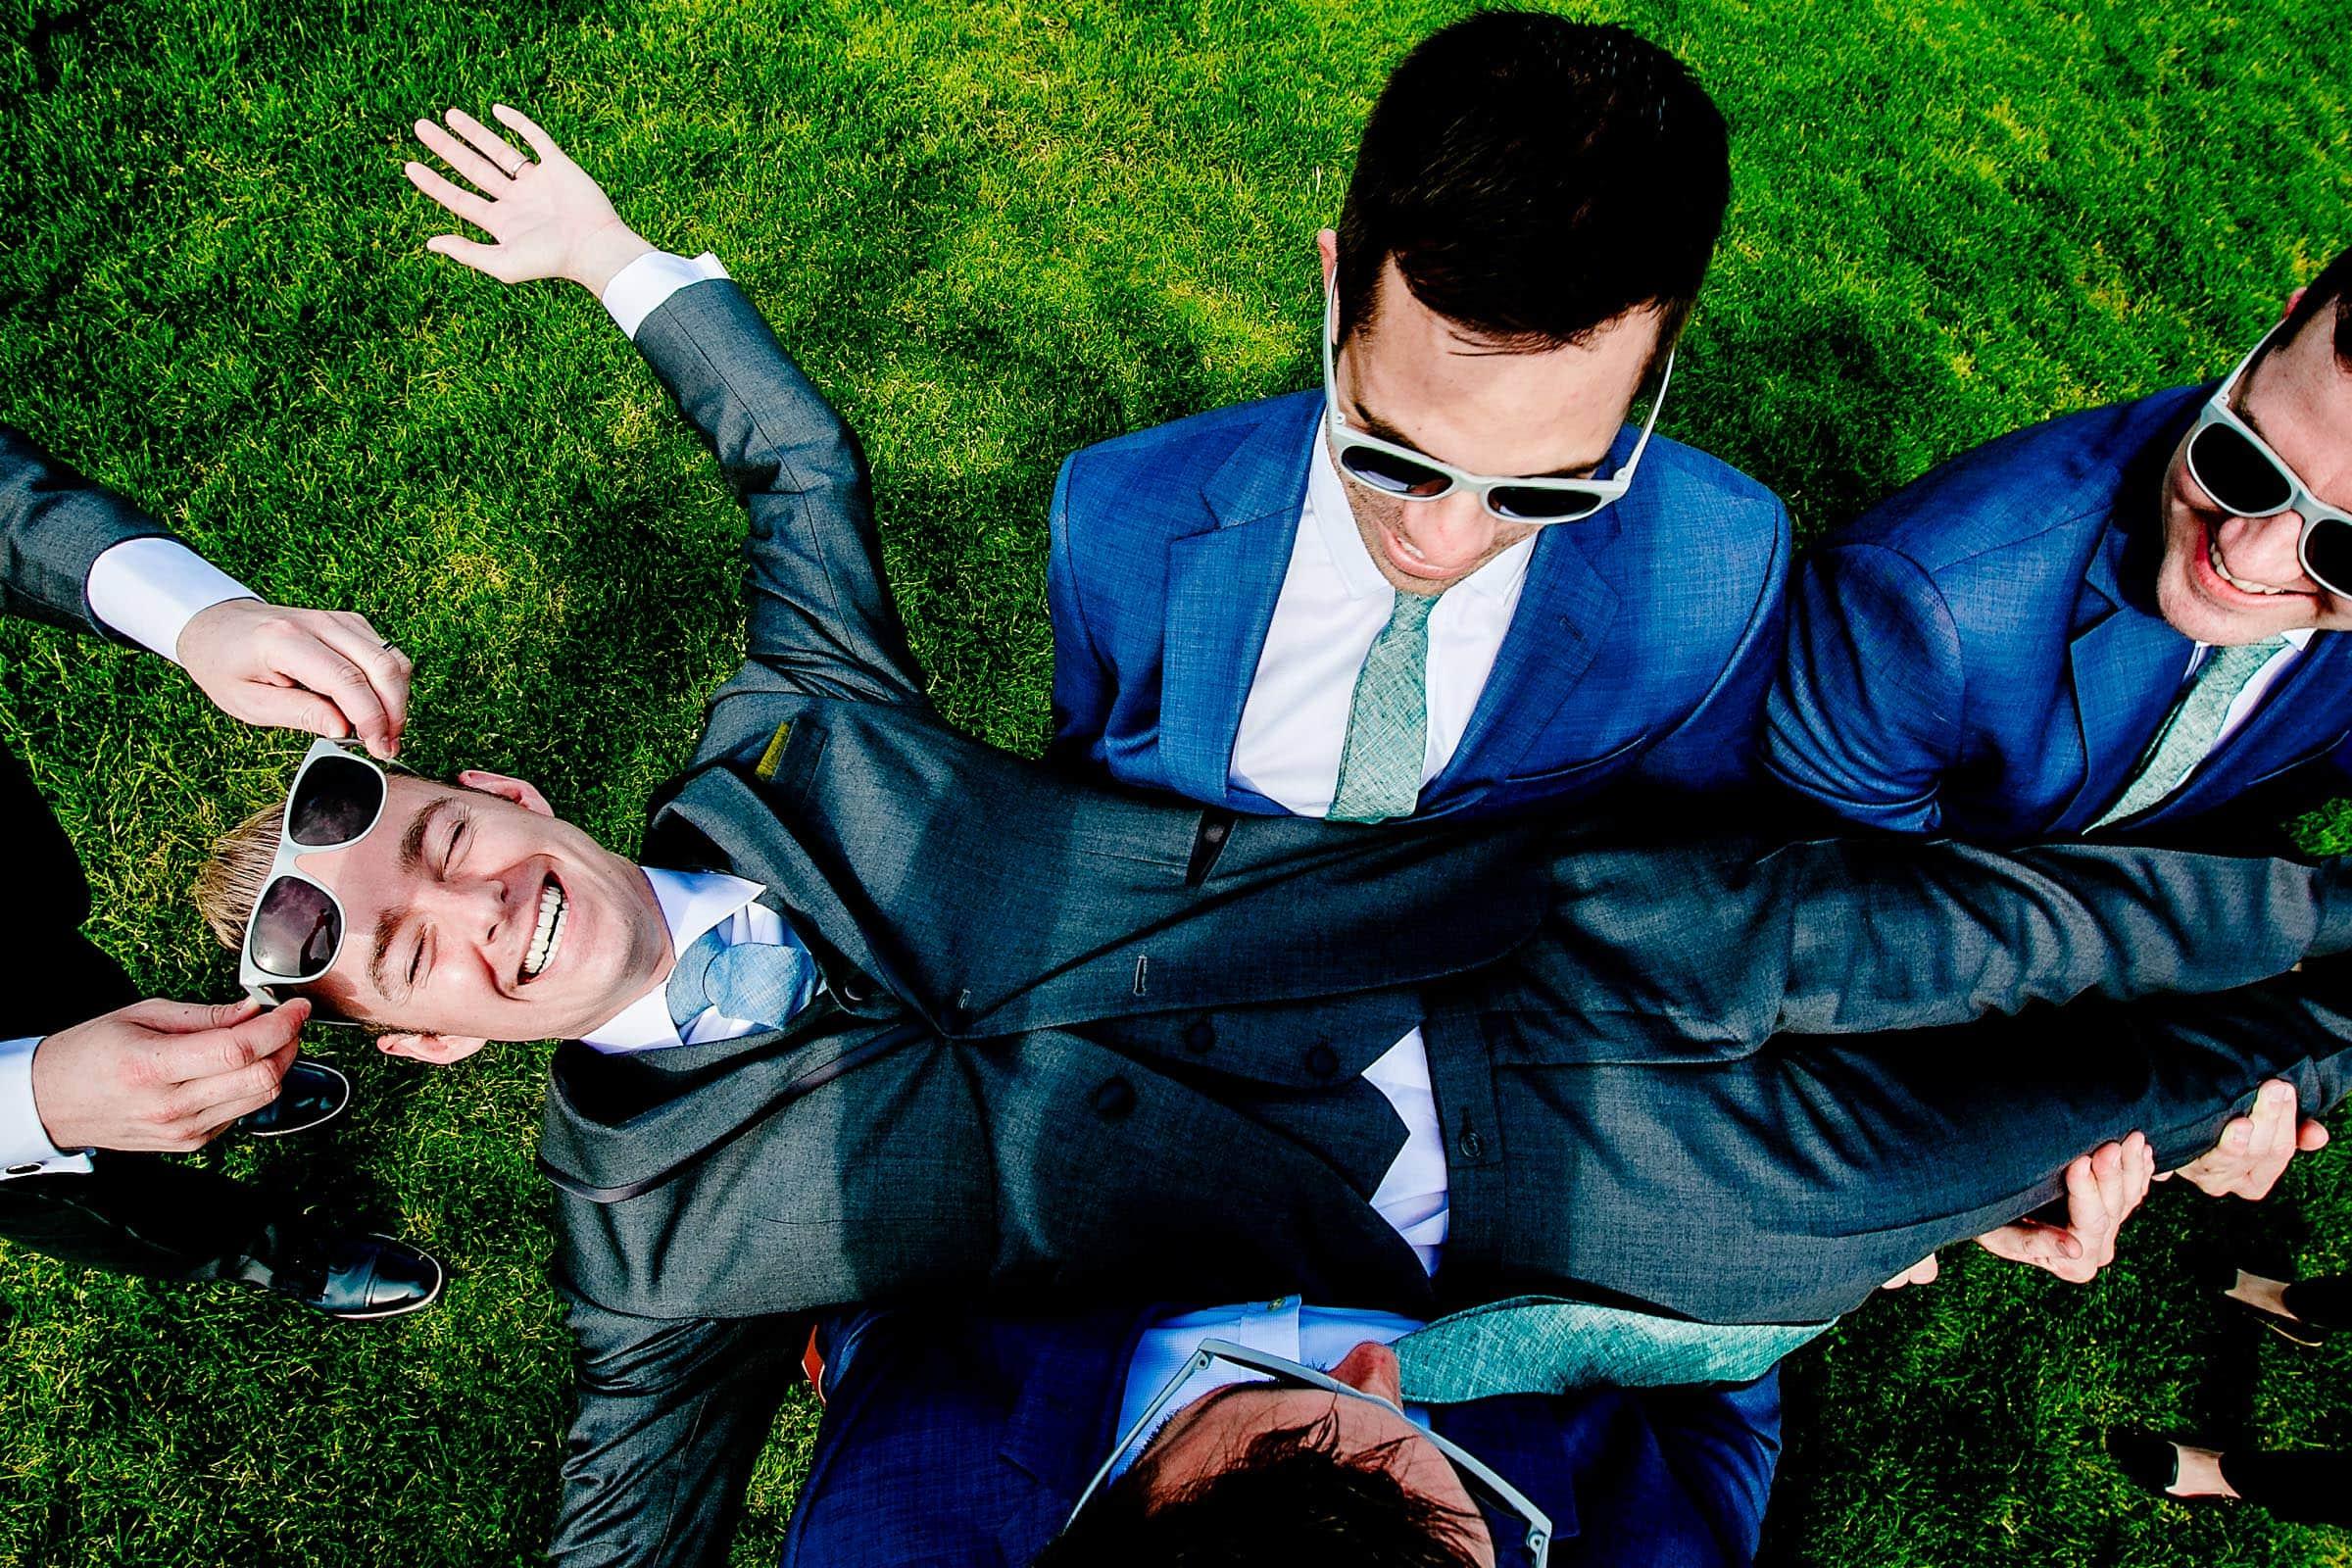 Fun candid photo of groomsmen on their way to a Castaway Portland wedding